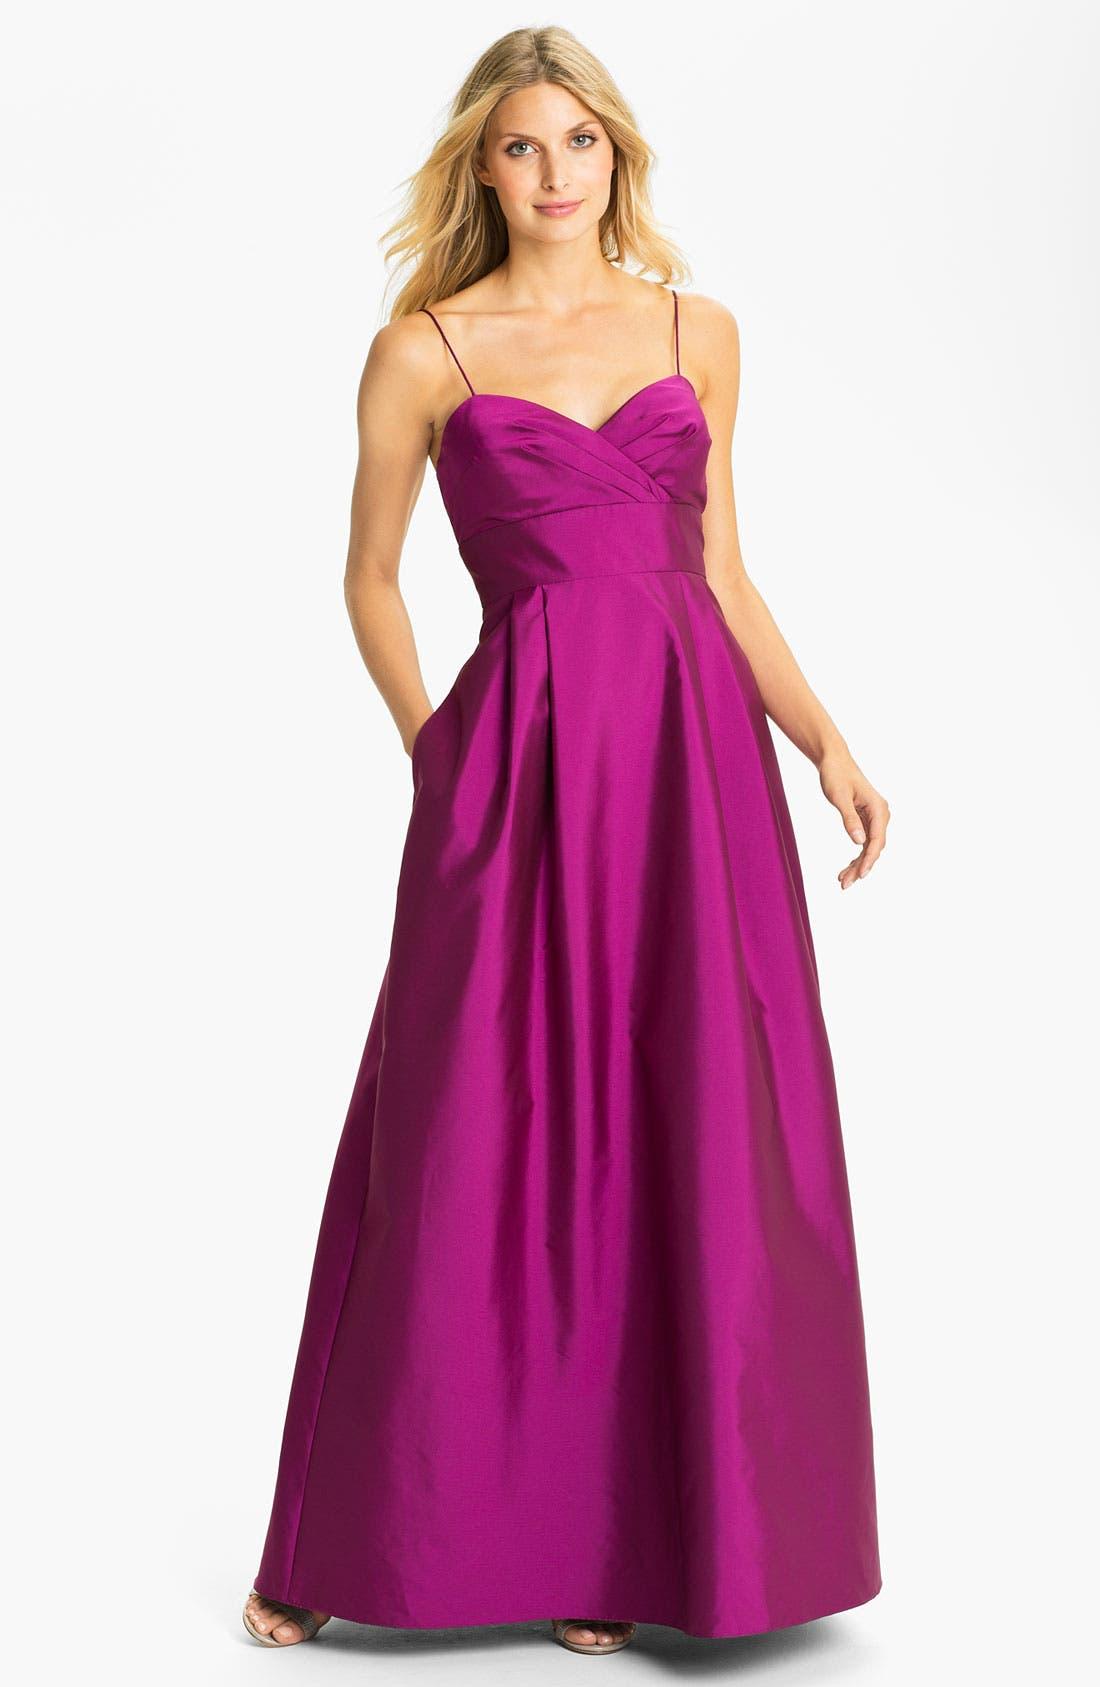 Alternate Image 1 Selected - Eliza J Spaghetti Strap Faille A-Line Gown